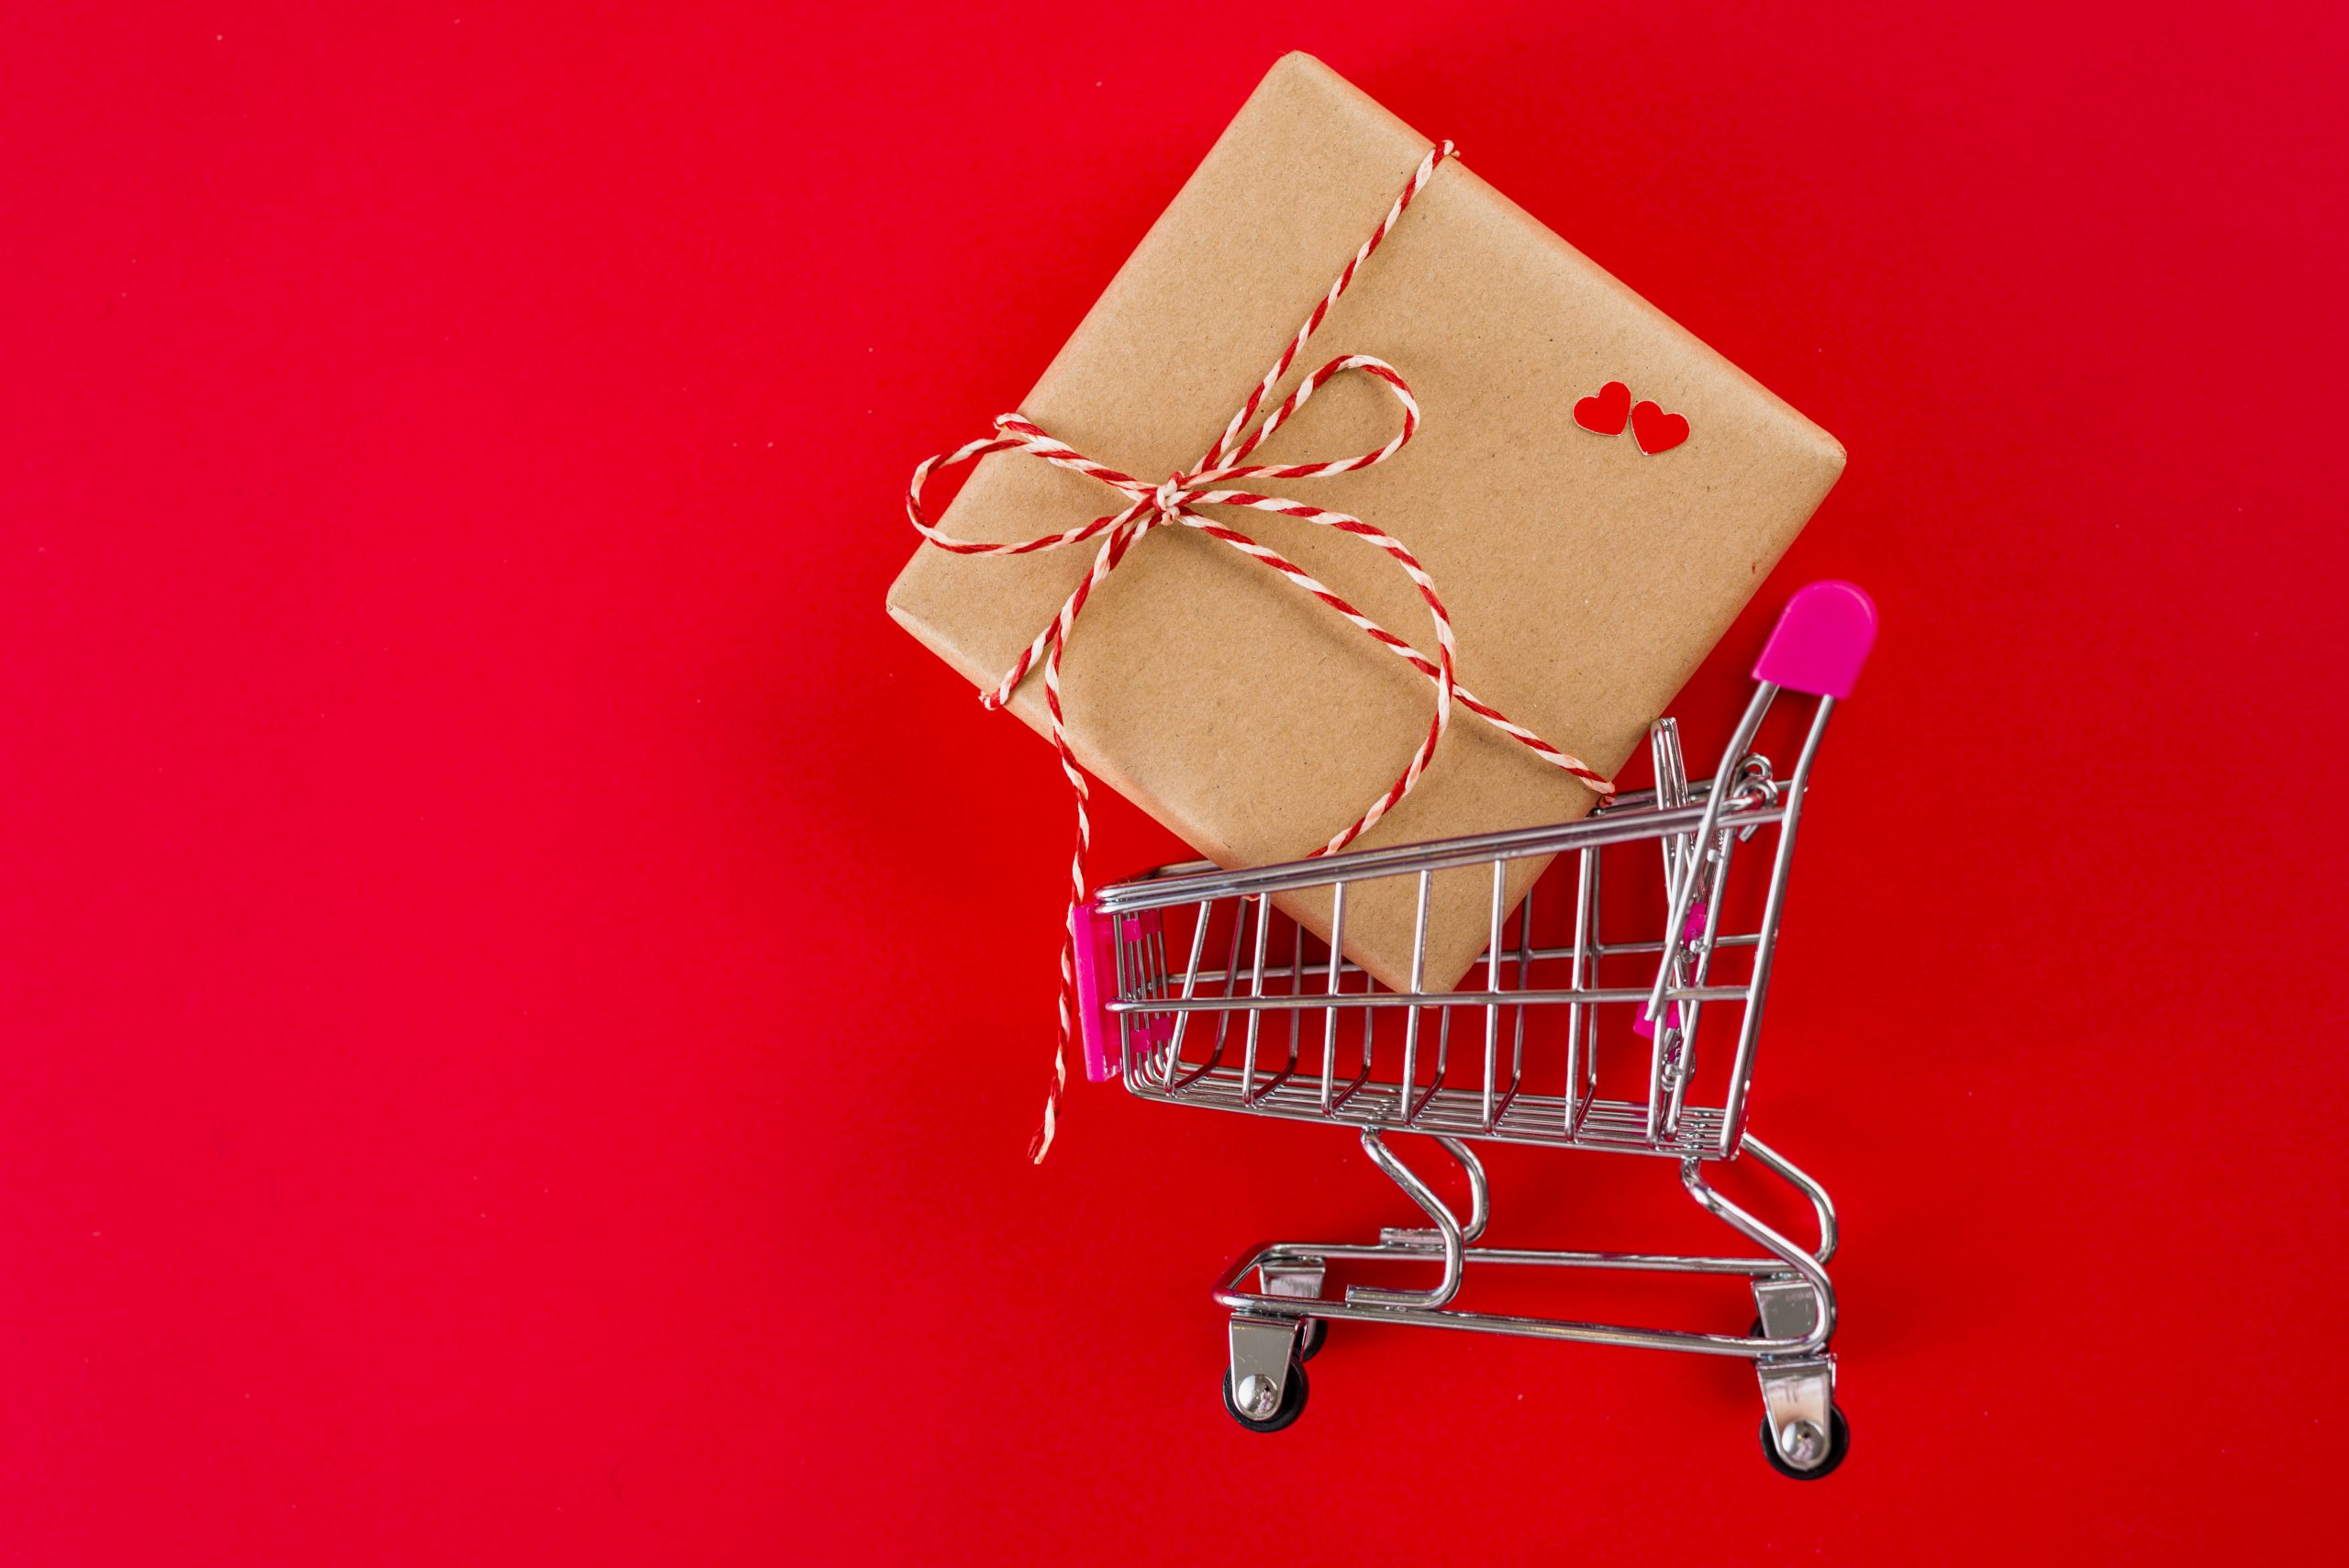 5 Amazon Seller Hacks for the Holiday Season